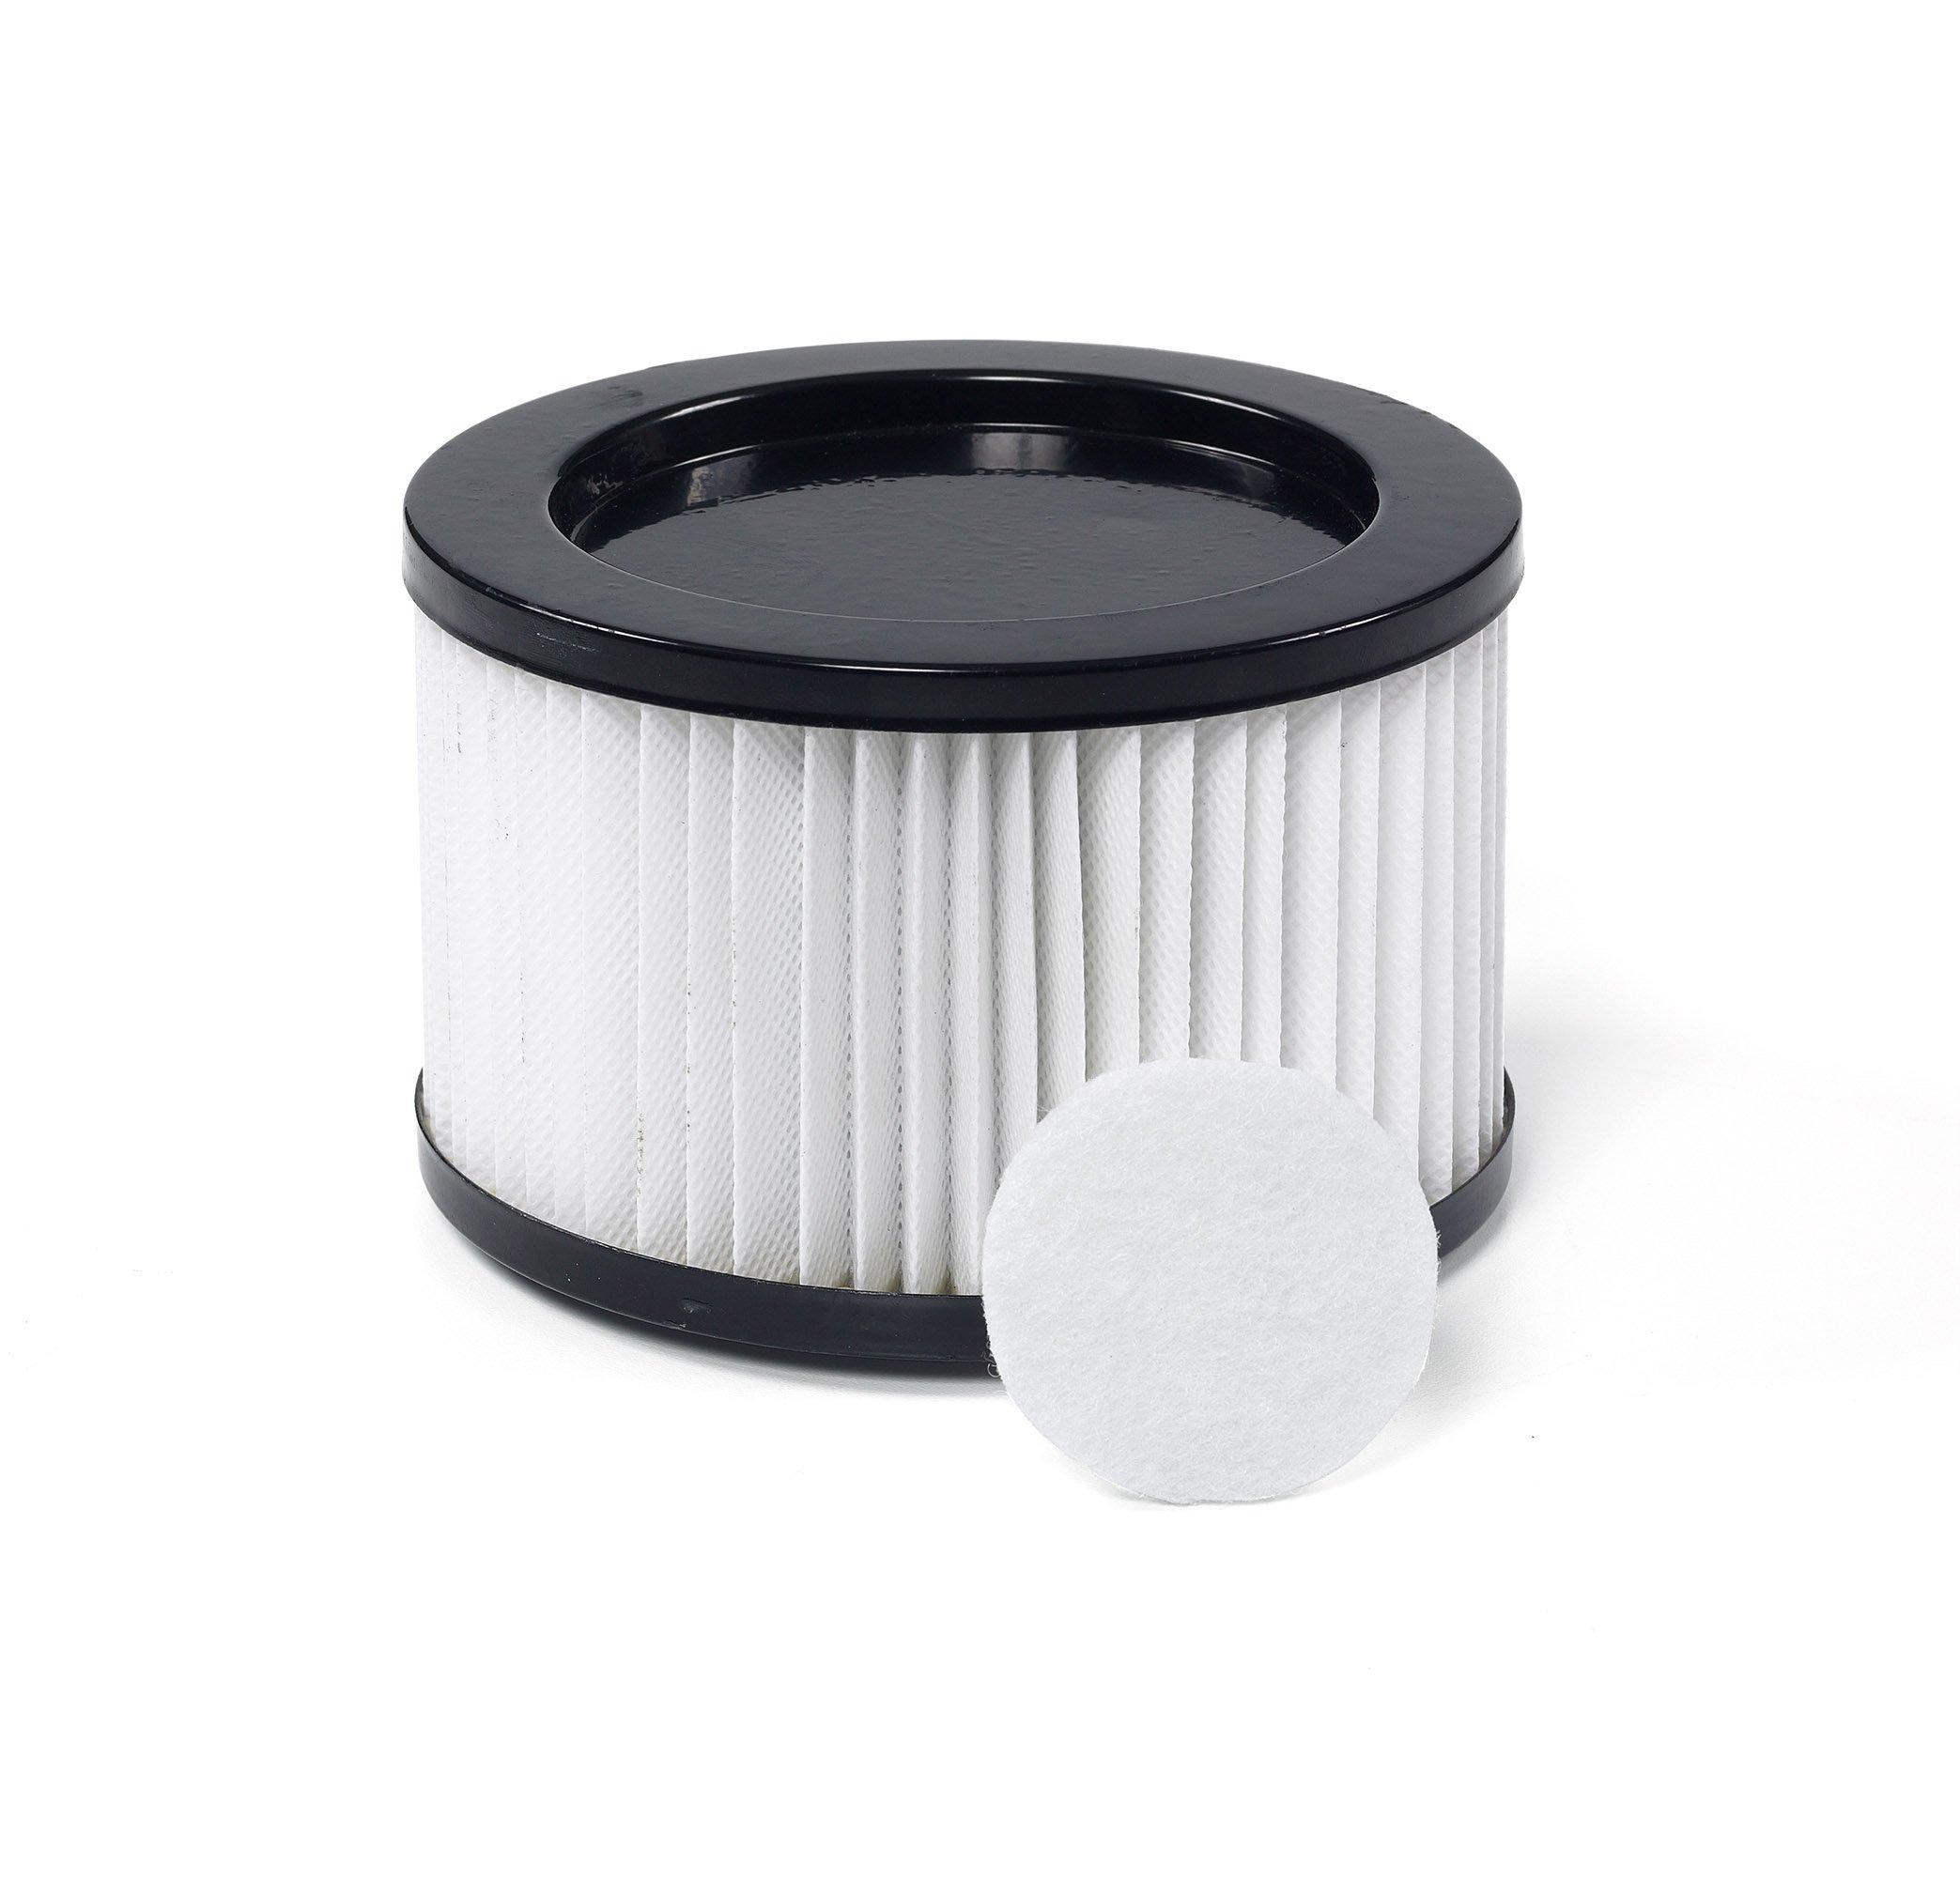 WORKSHOP Wet Dry Vacuum Filter WS15050F HEPA Media Filter For WS0500ASH Ash Vacuum